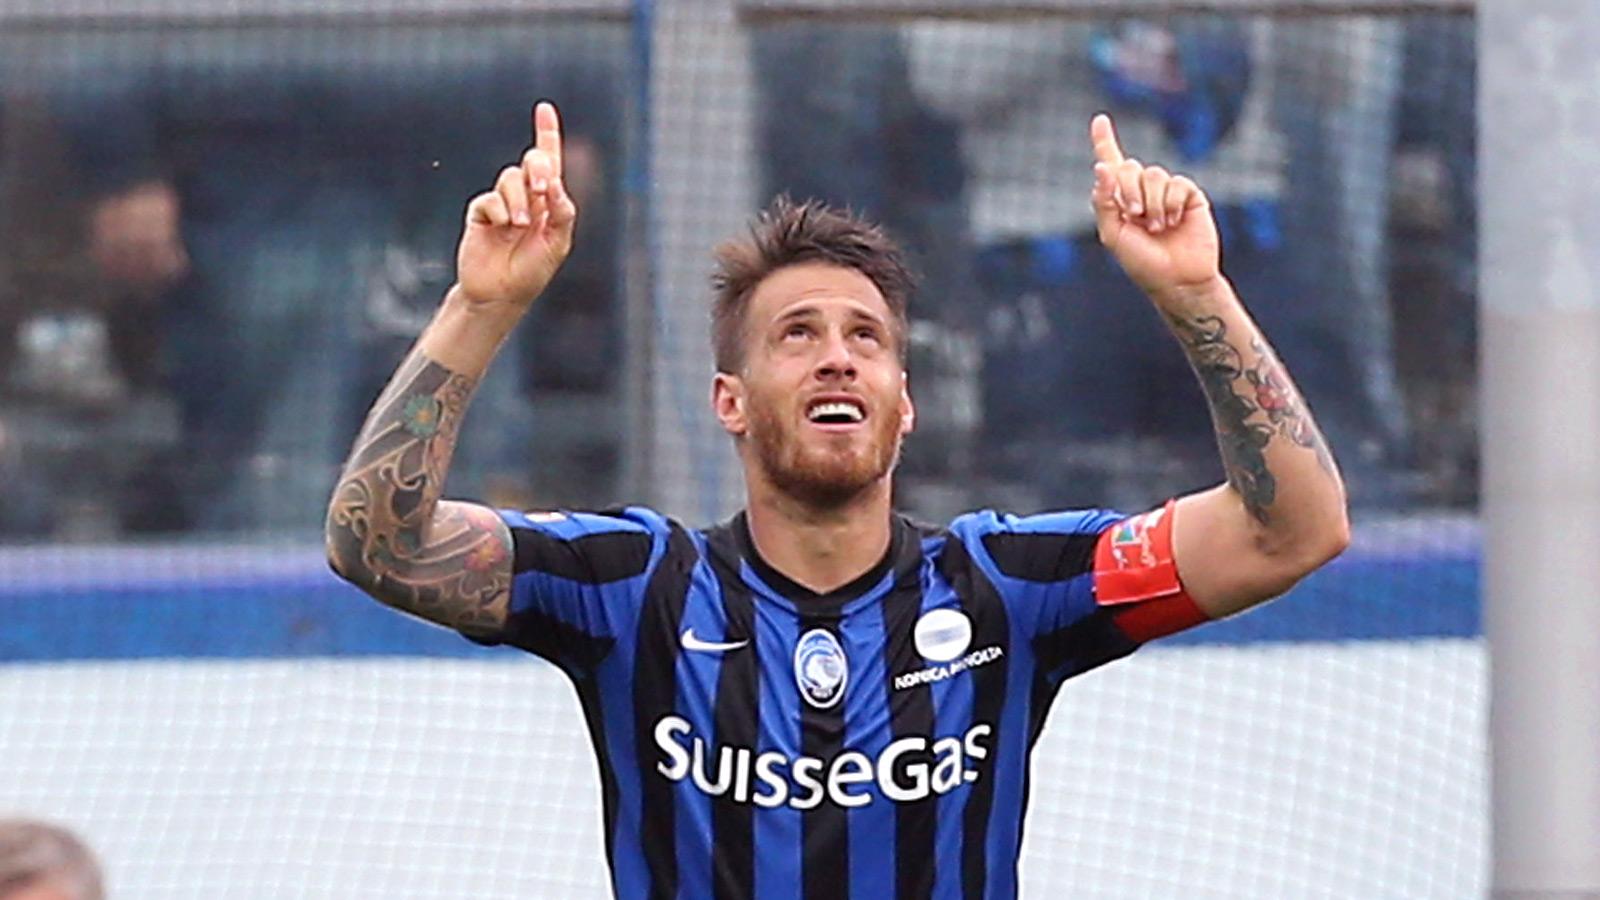 Serie A: Atalanta earn valuable point with late draw; Lazio tie Chievo